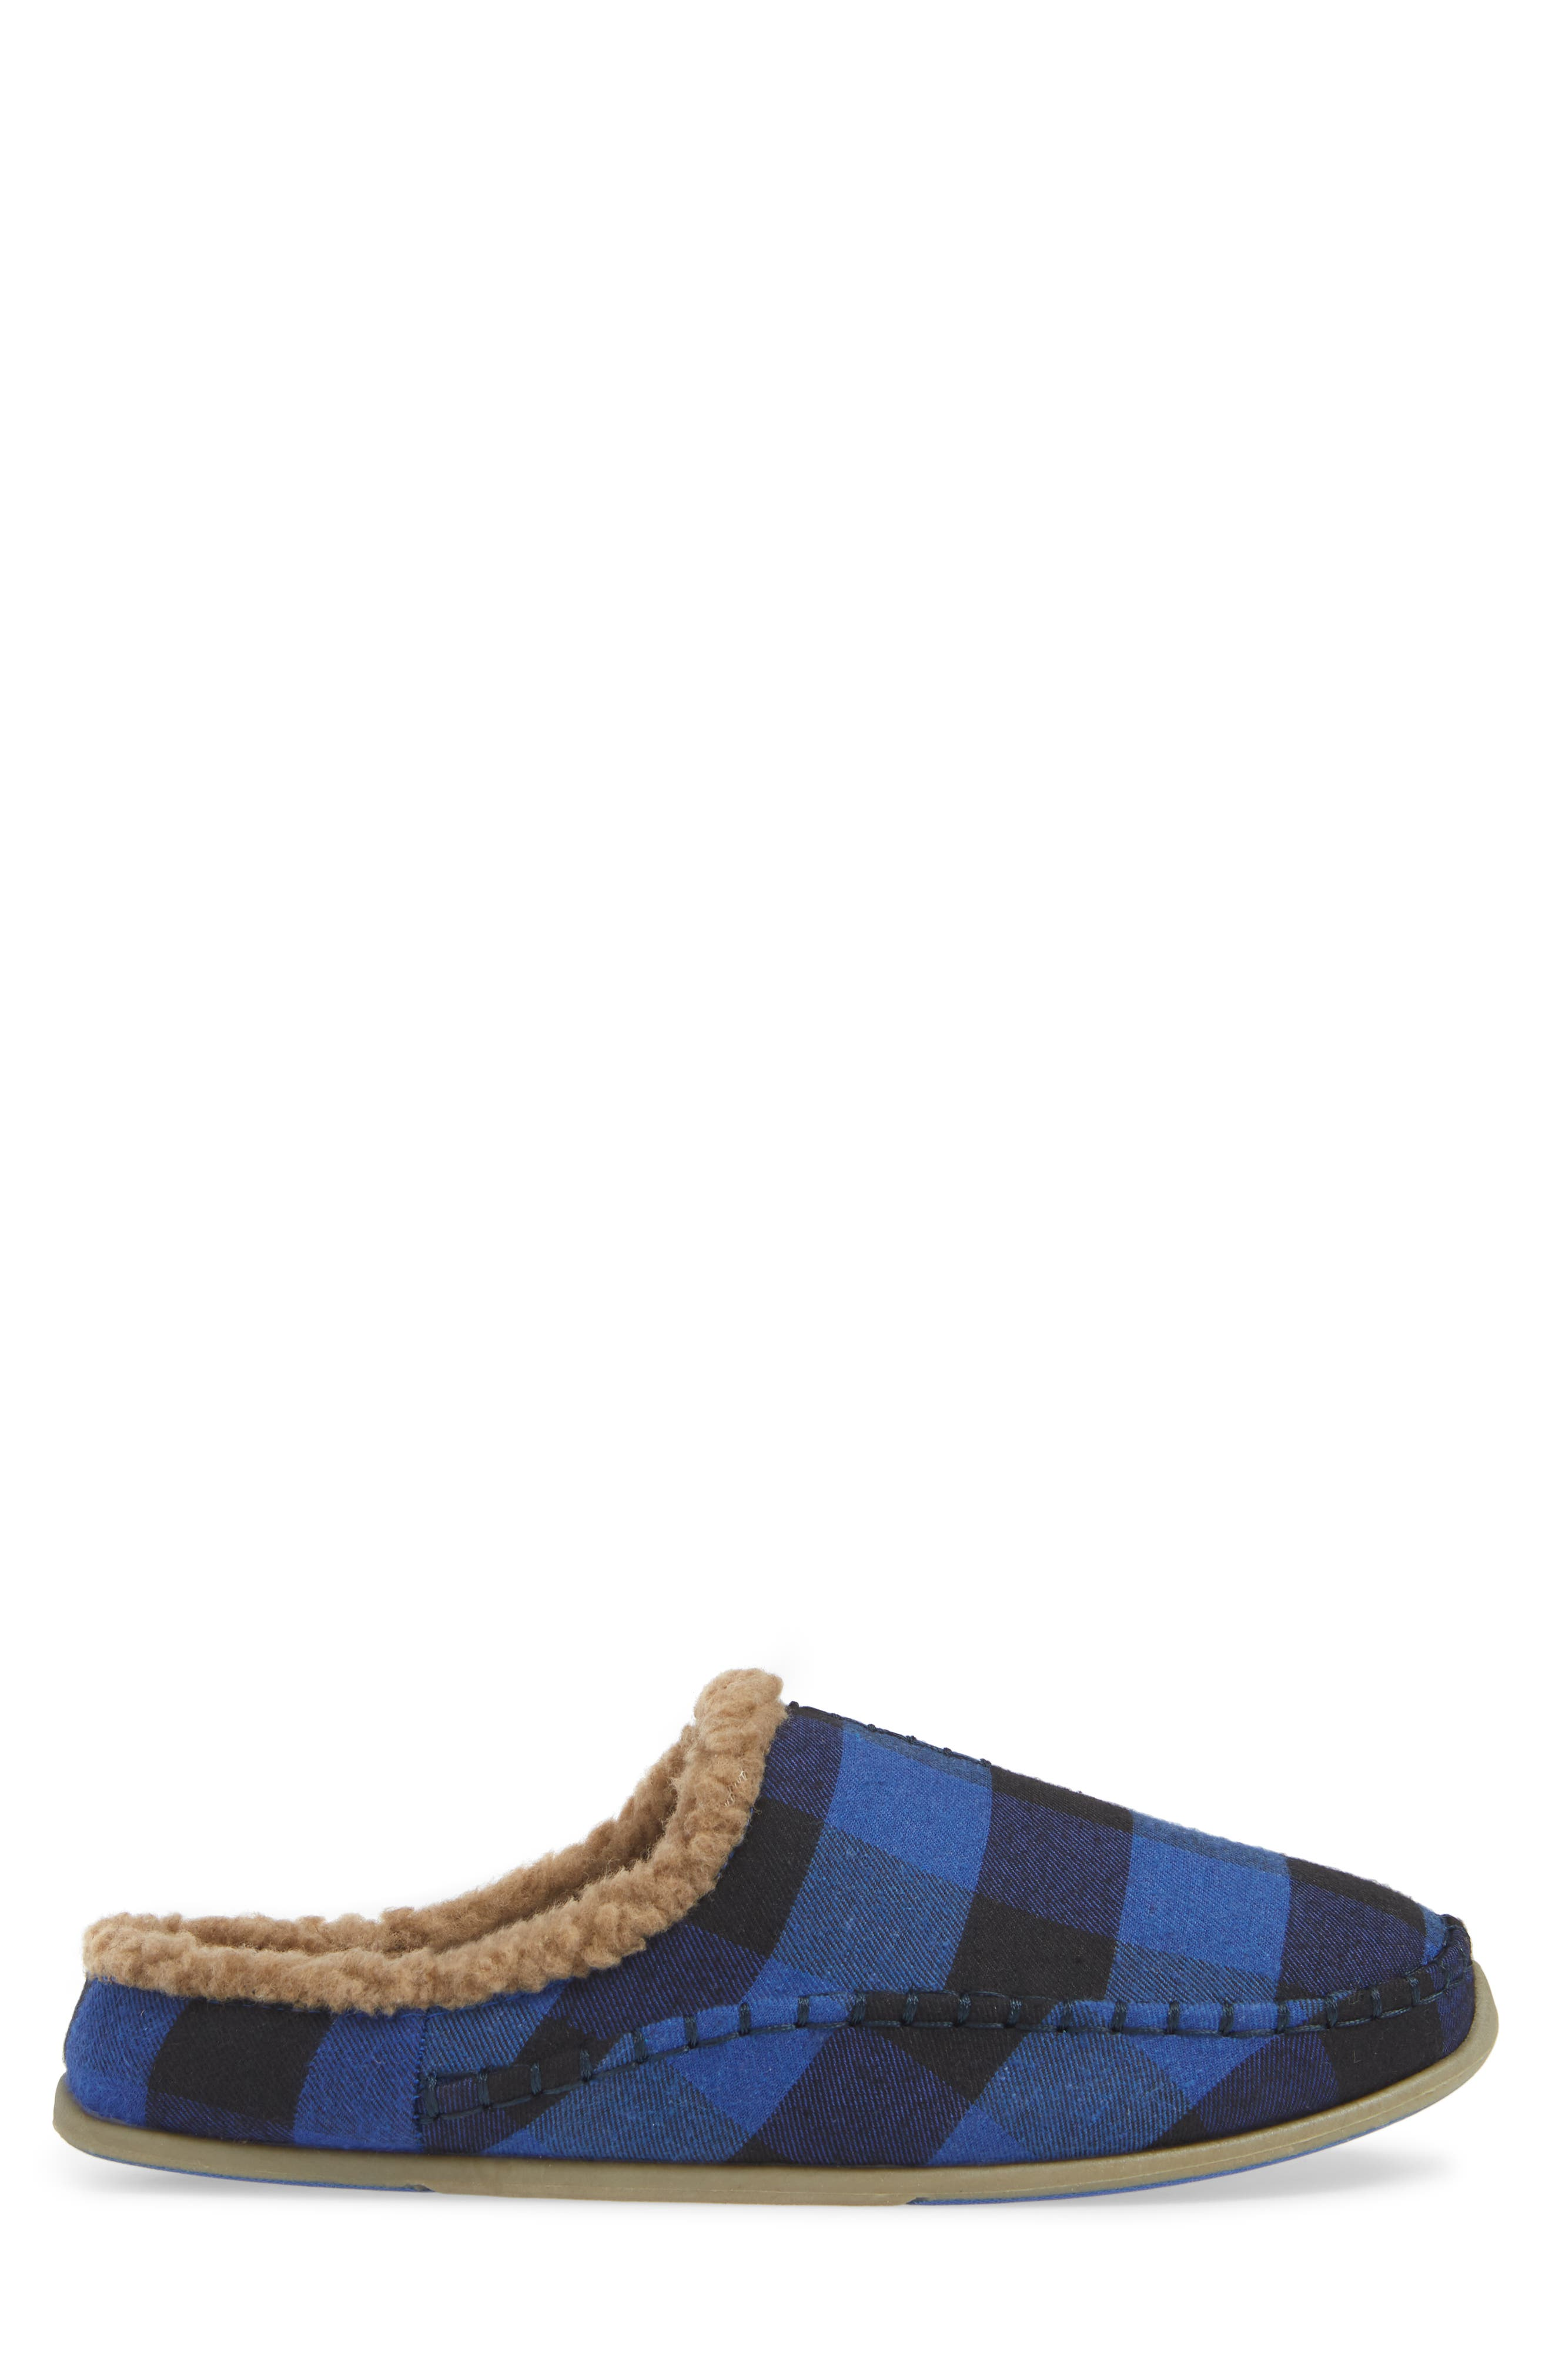 Nordic Slipper,                             Alternate thumbnail 3, color,                             BLUE / BLACK